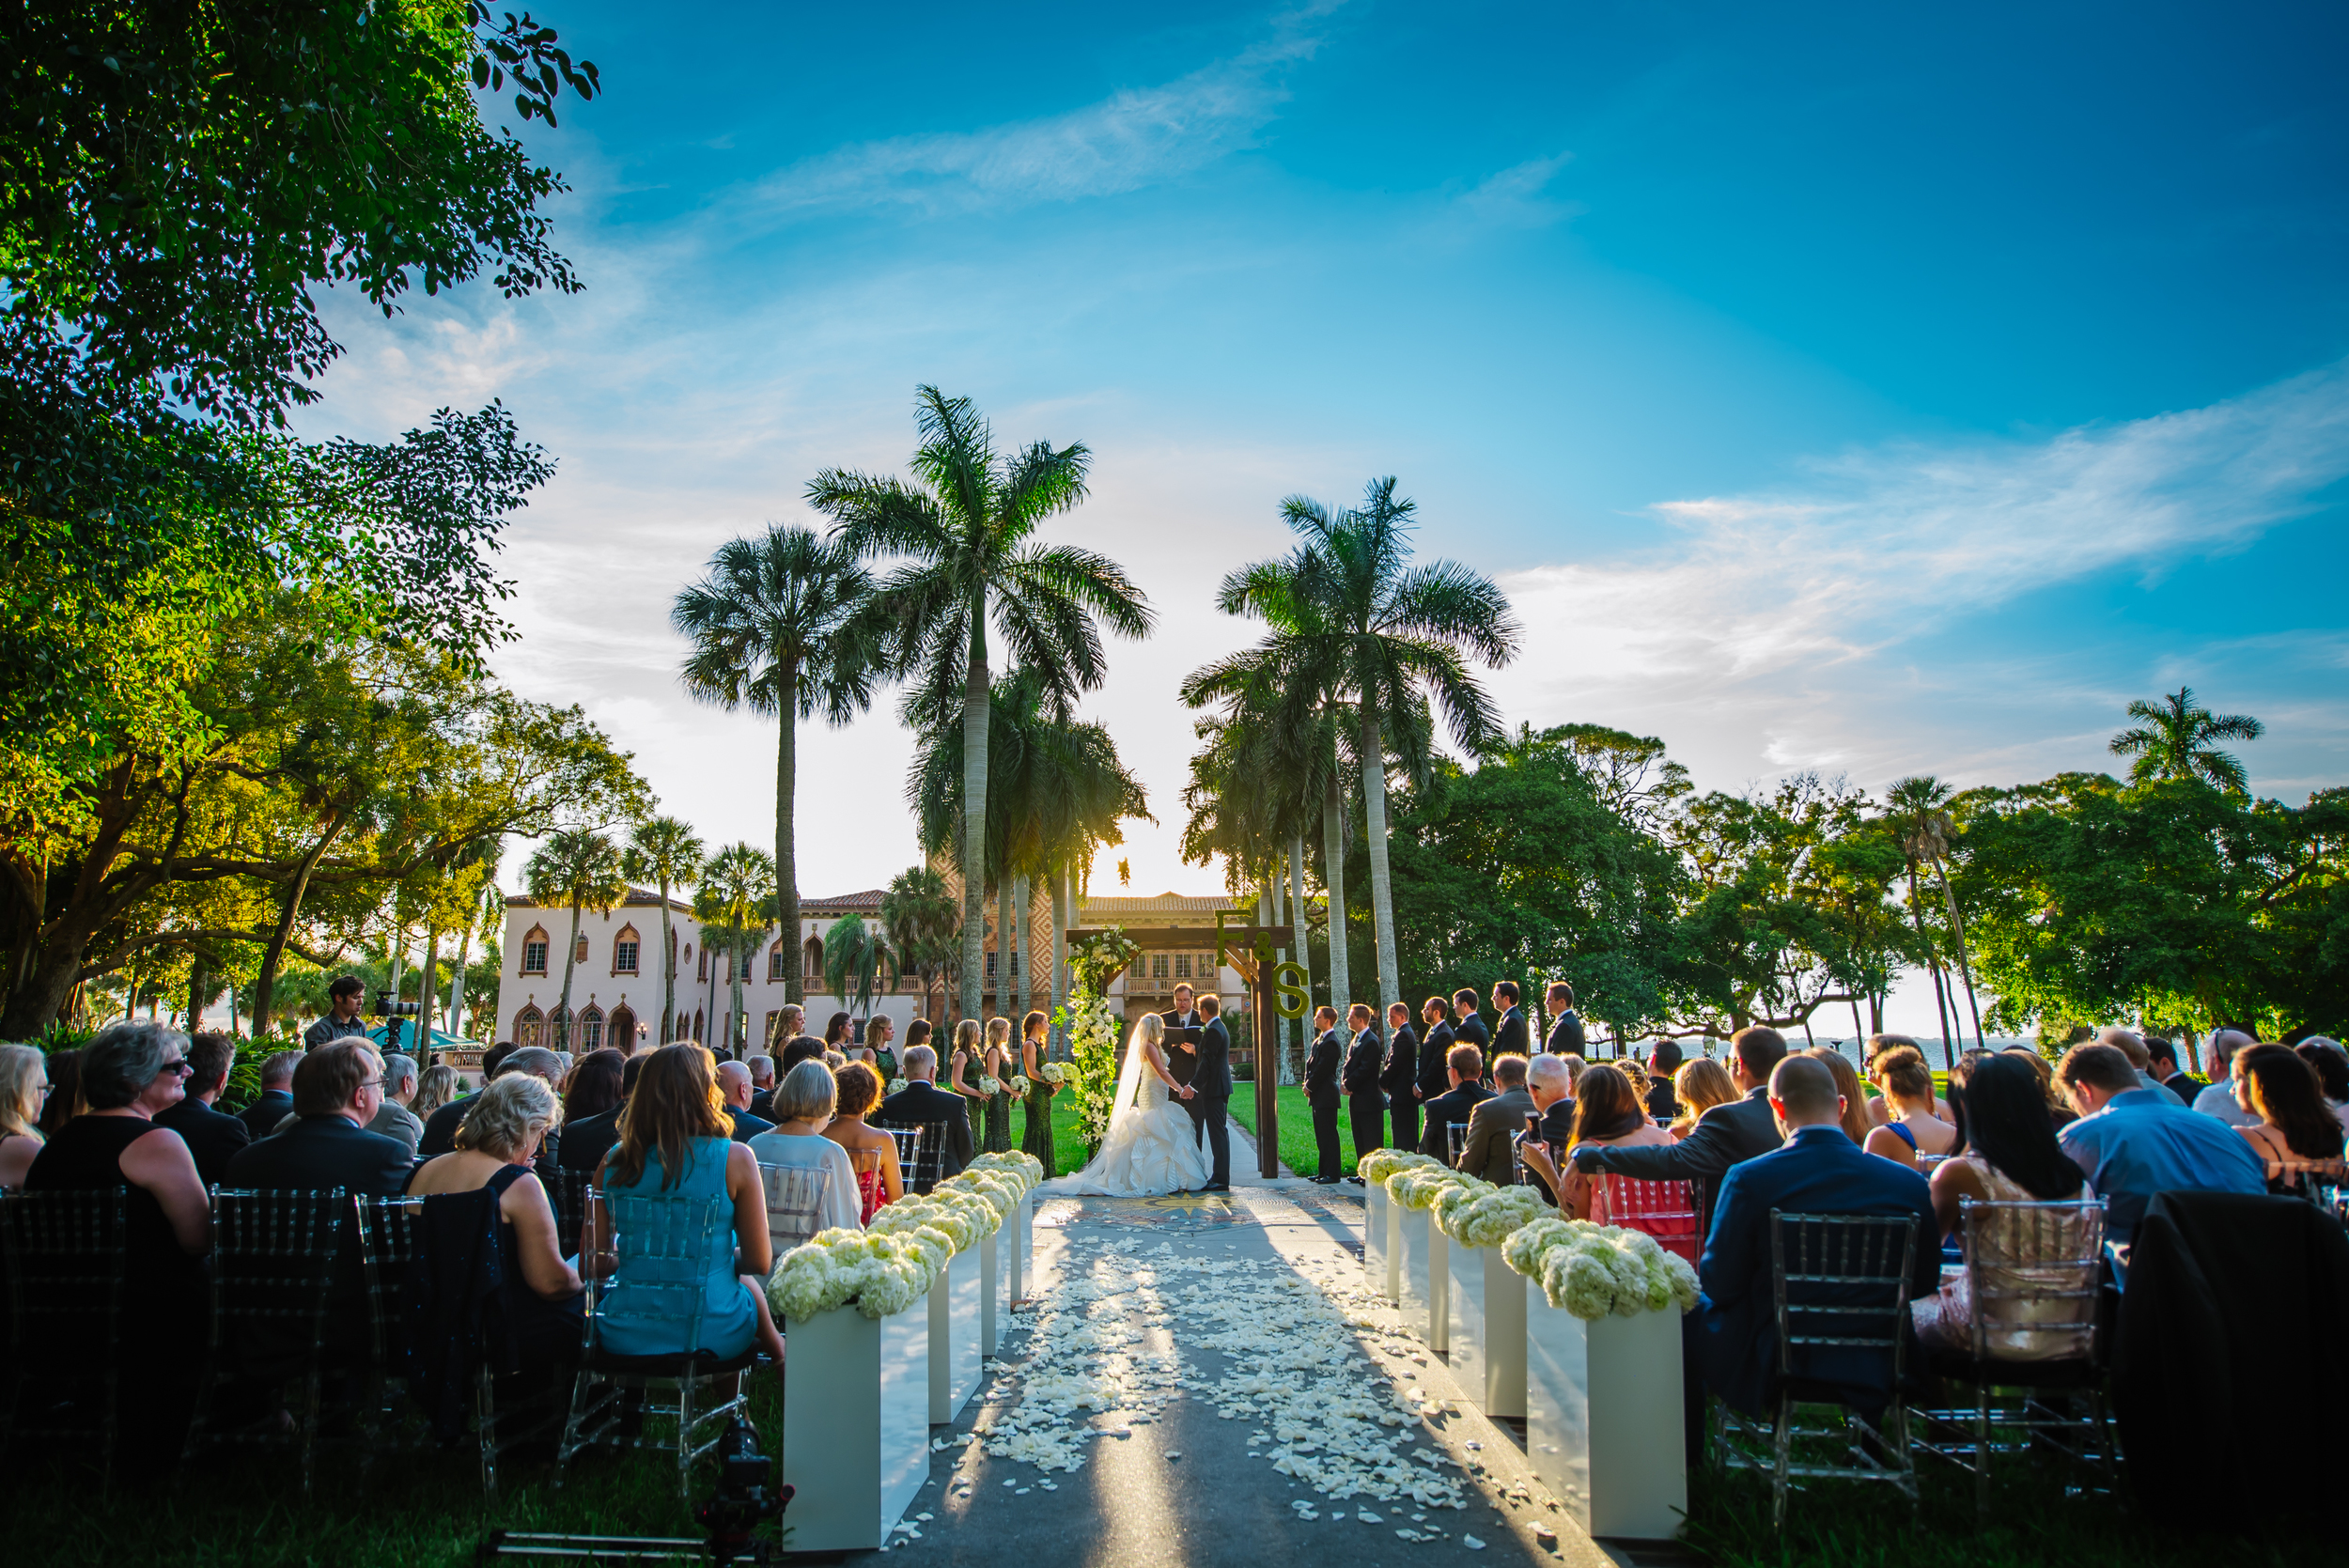 tampa-wedding-photographer-ca-dzan-luxury-ceremony-vibrant-blue-sky